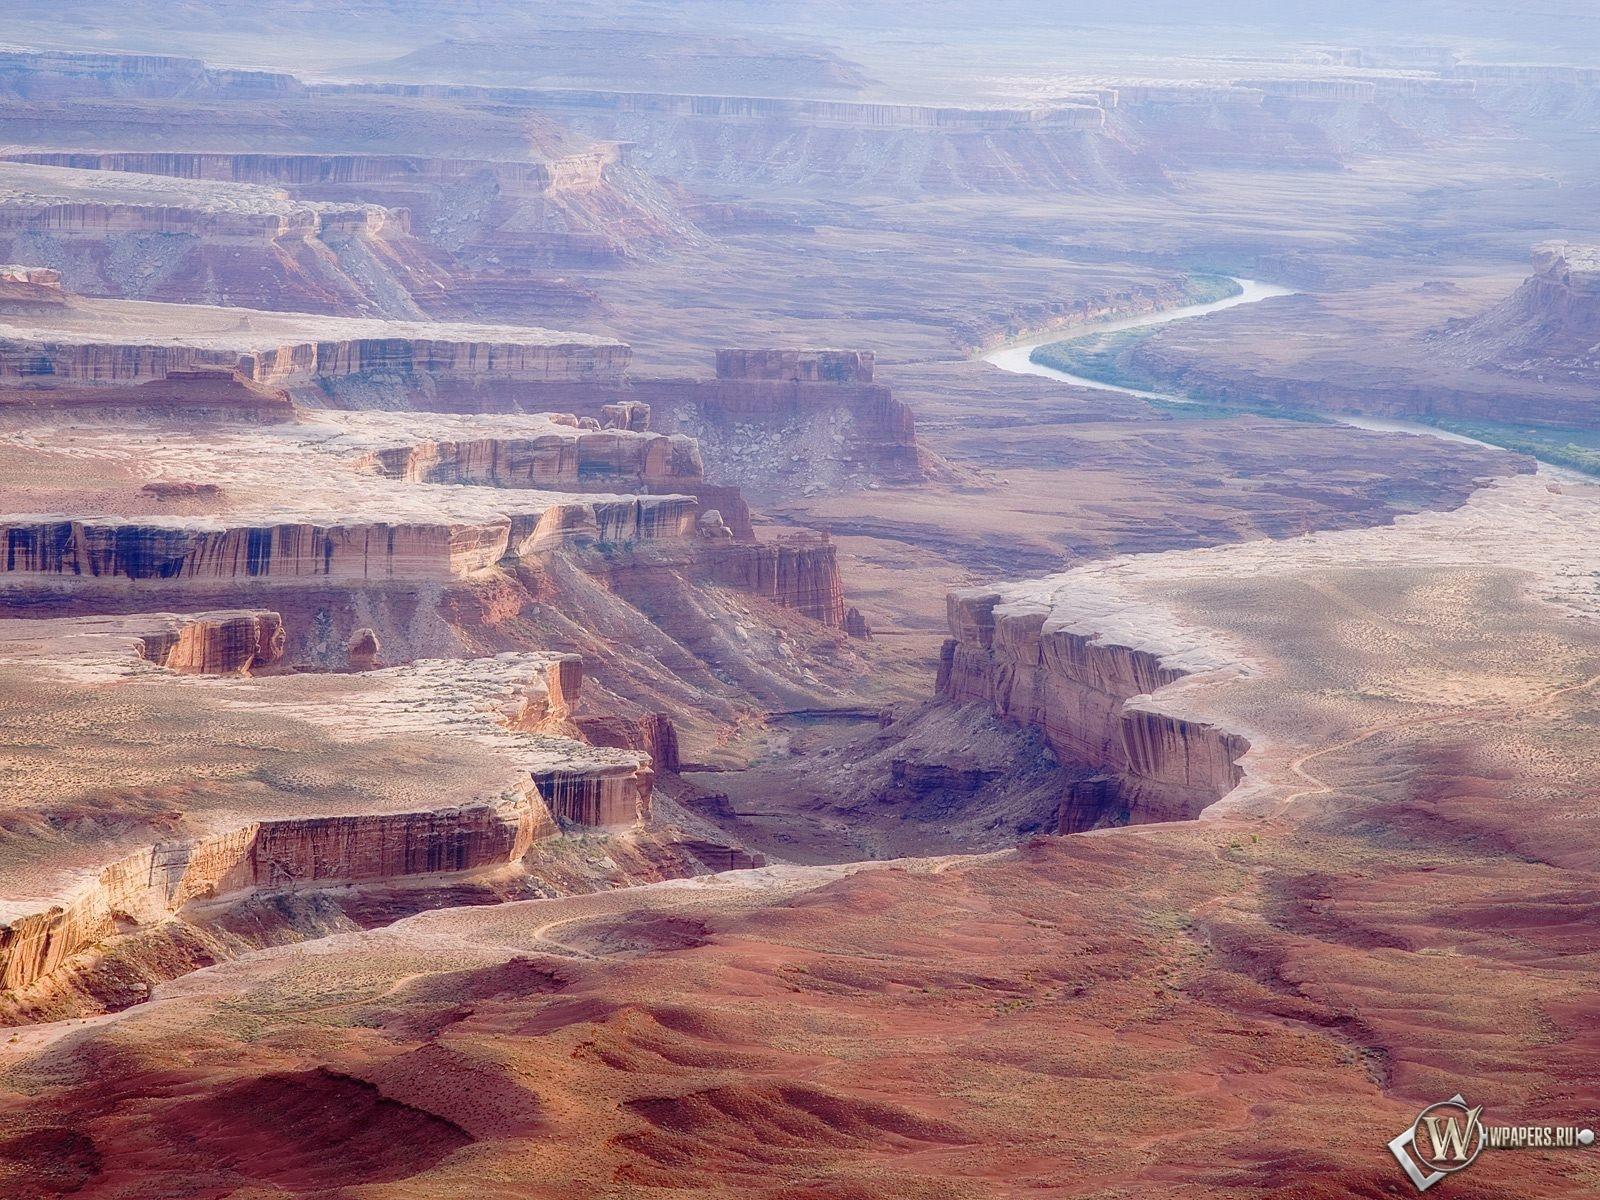 Canyonlands National Park 1600x1200